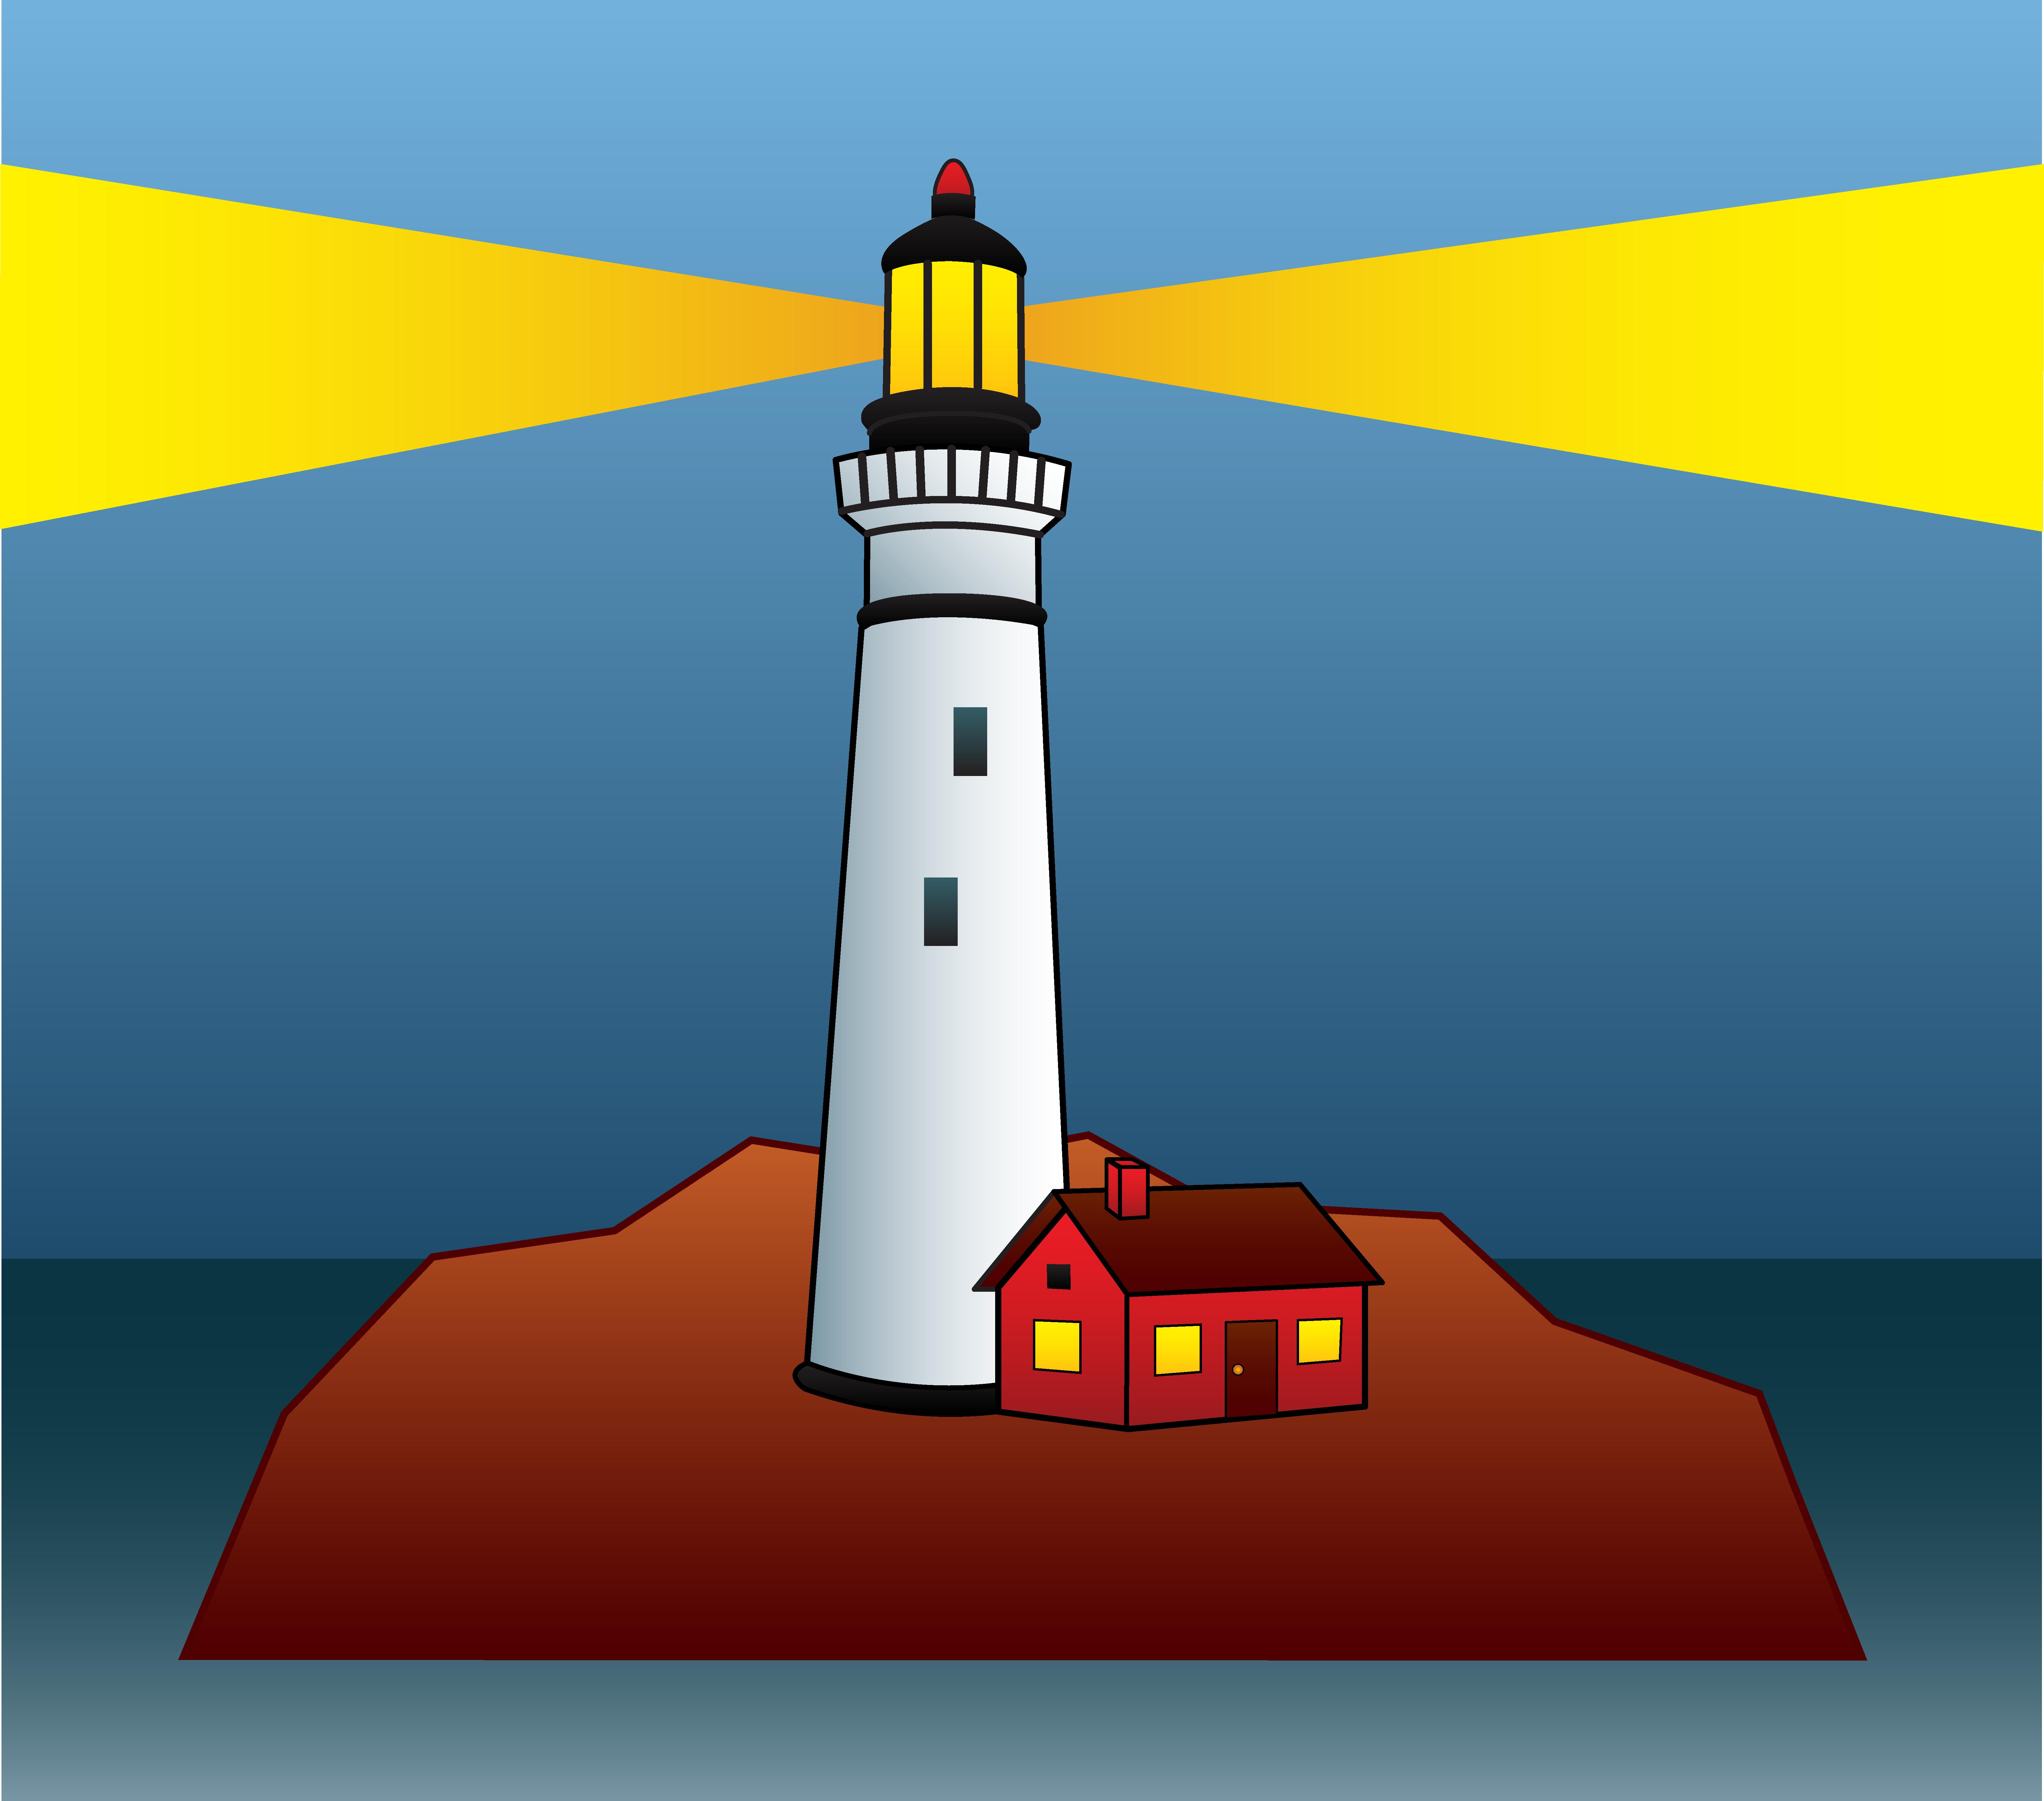 Lighthouse Shining Light At Night - Free Clip Art